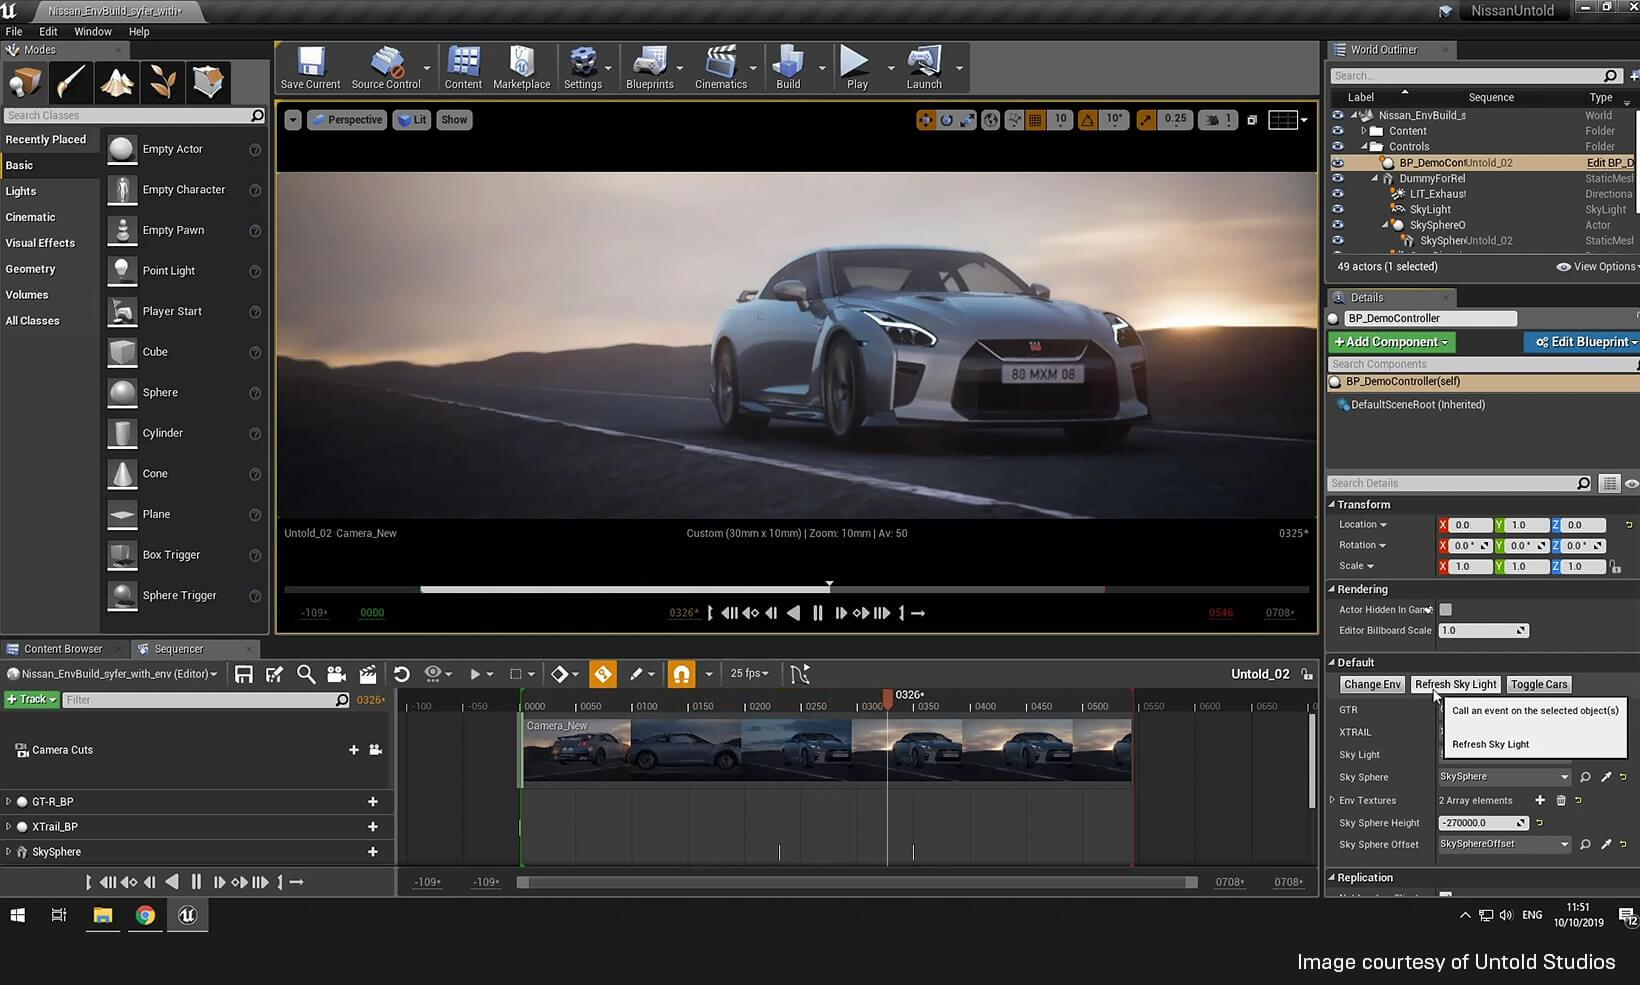 Spotlight_Nissan_blog_body_img1.jpg